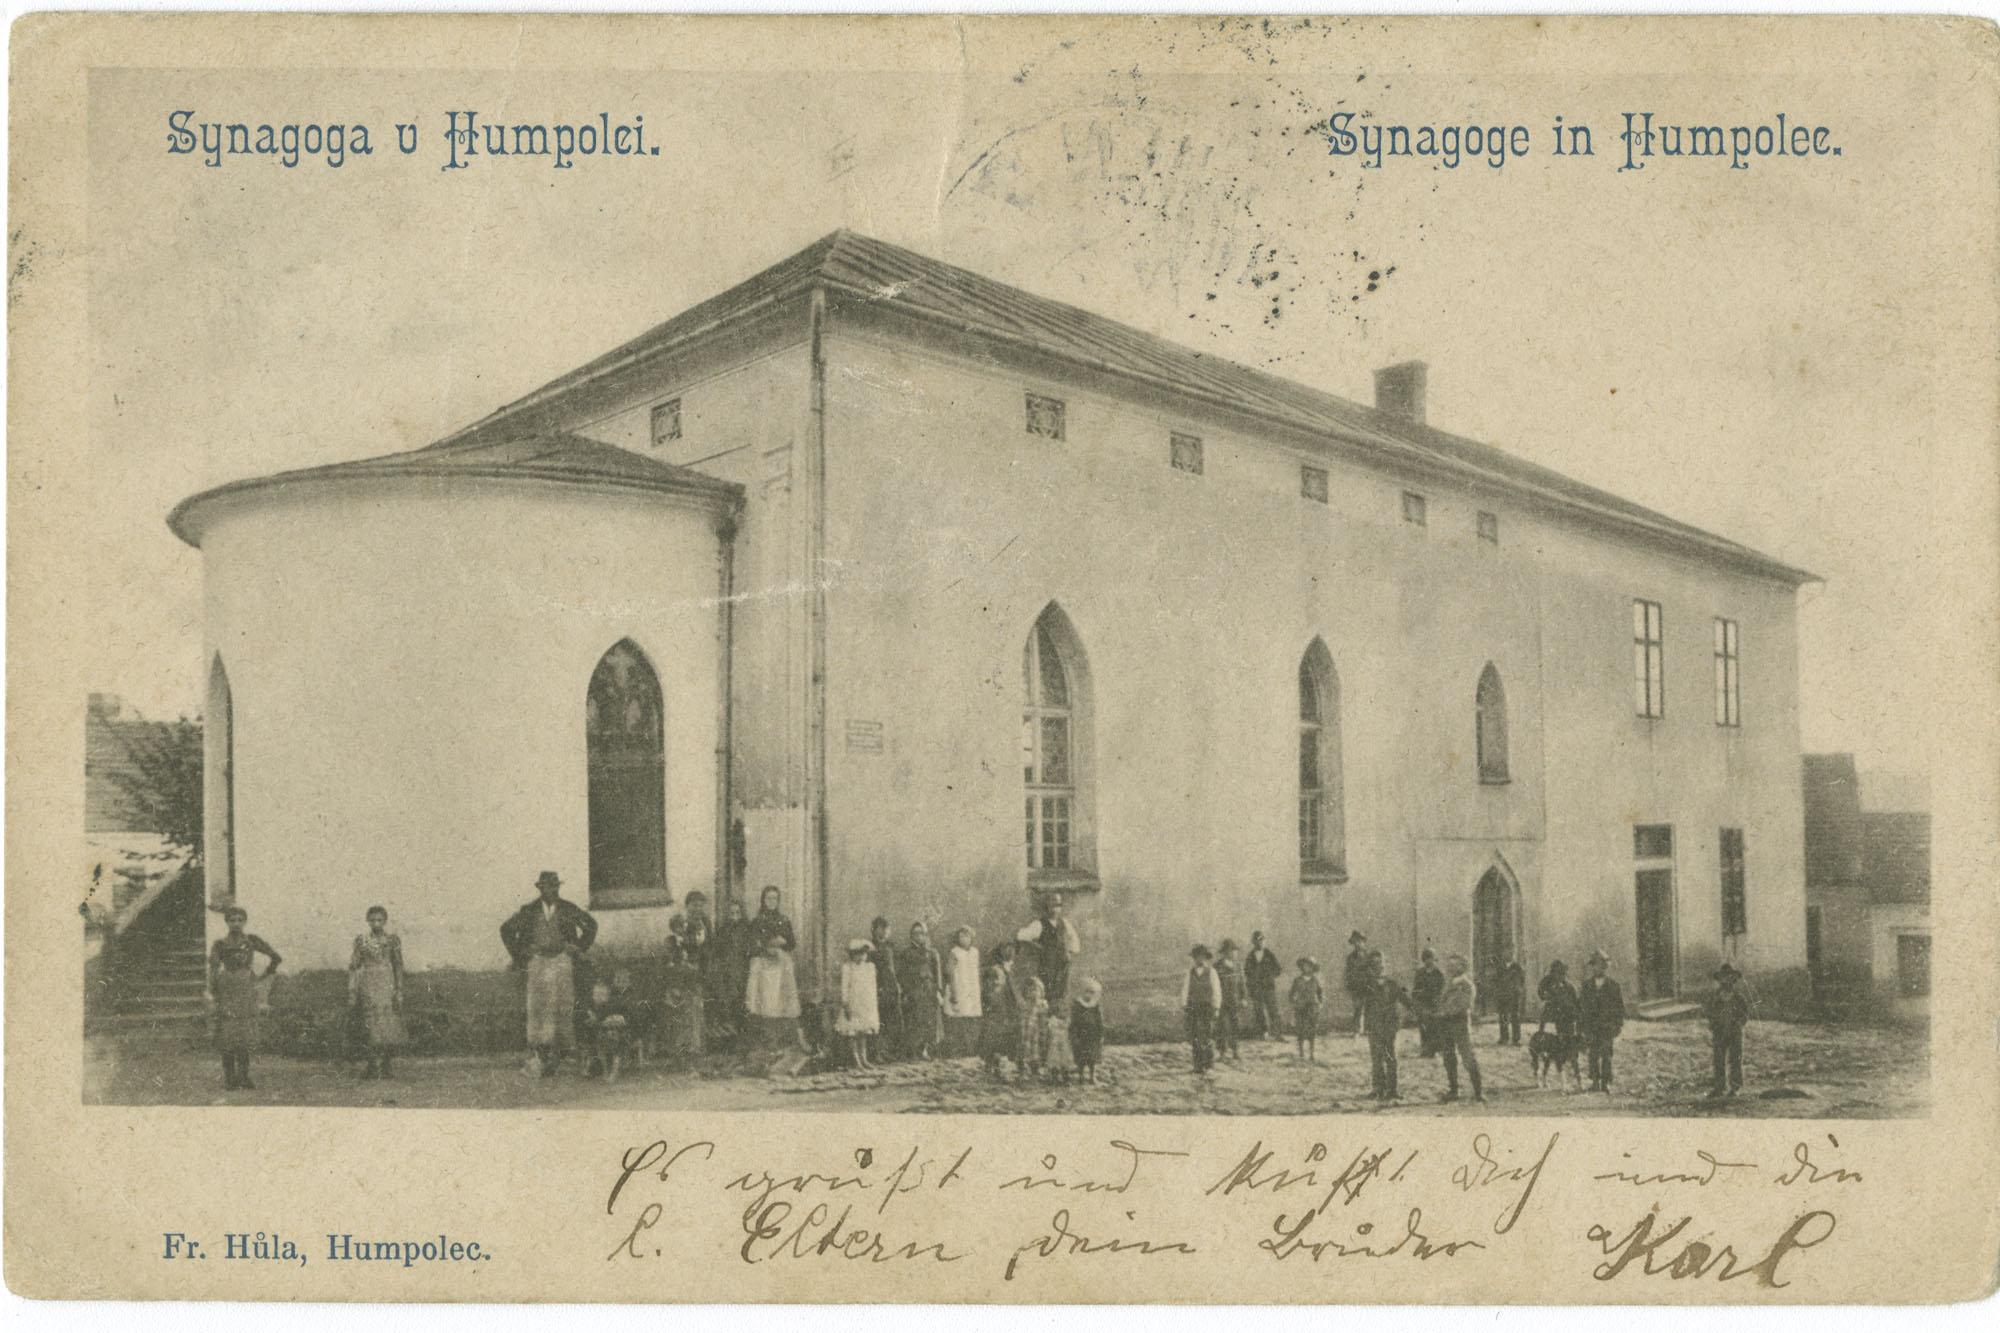 Synagoga u Humpolei. / Synagoge in Humpolec.